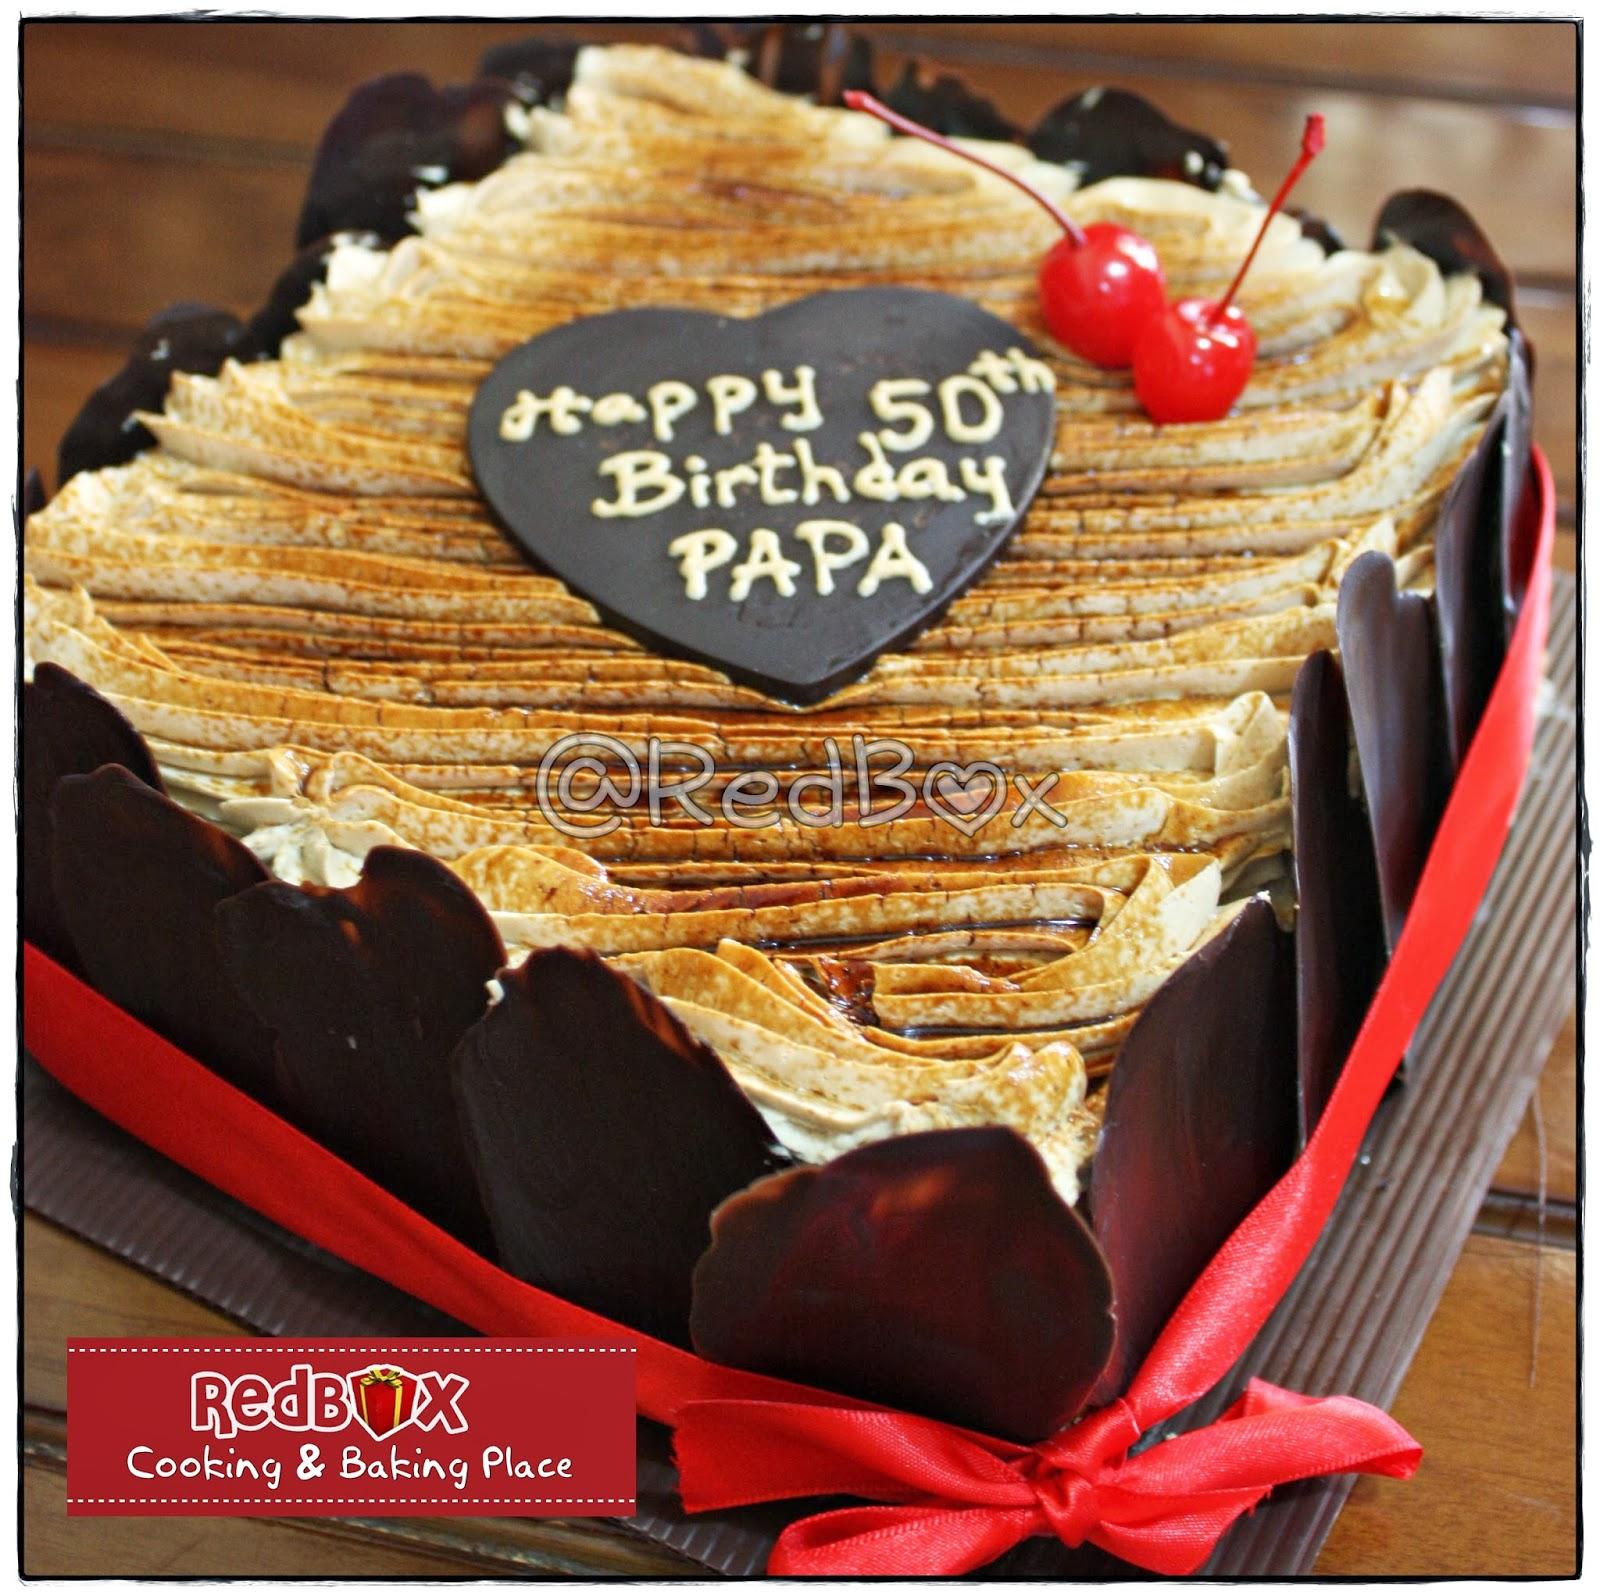 Vini Cakery: Tiramisu Cake